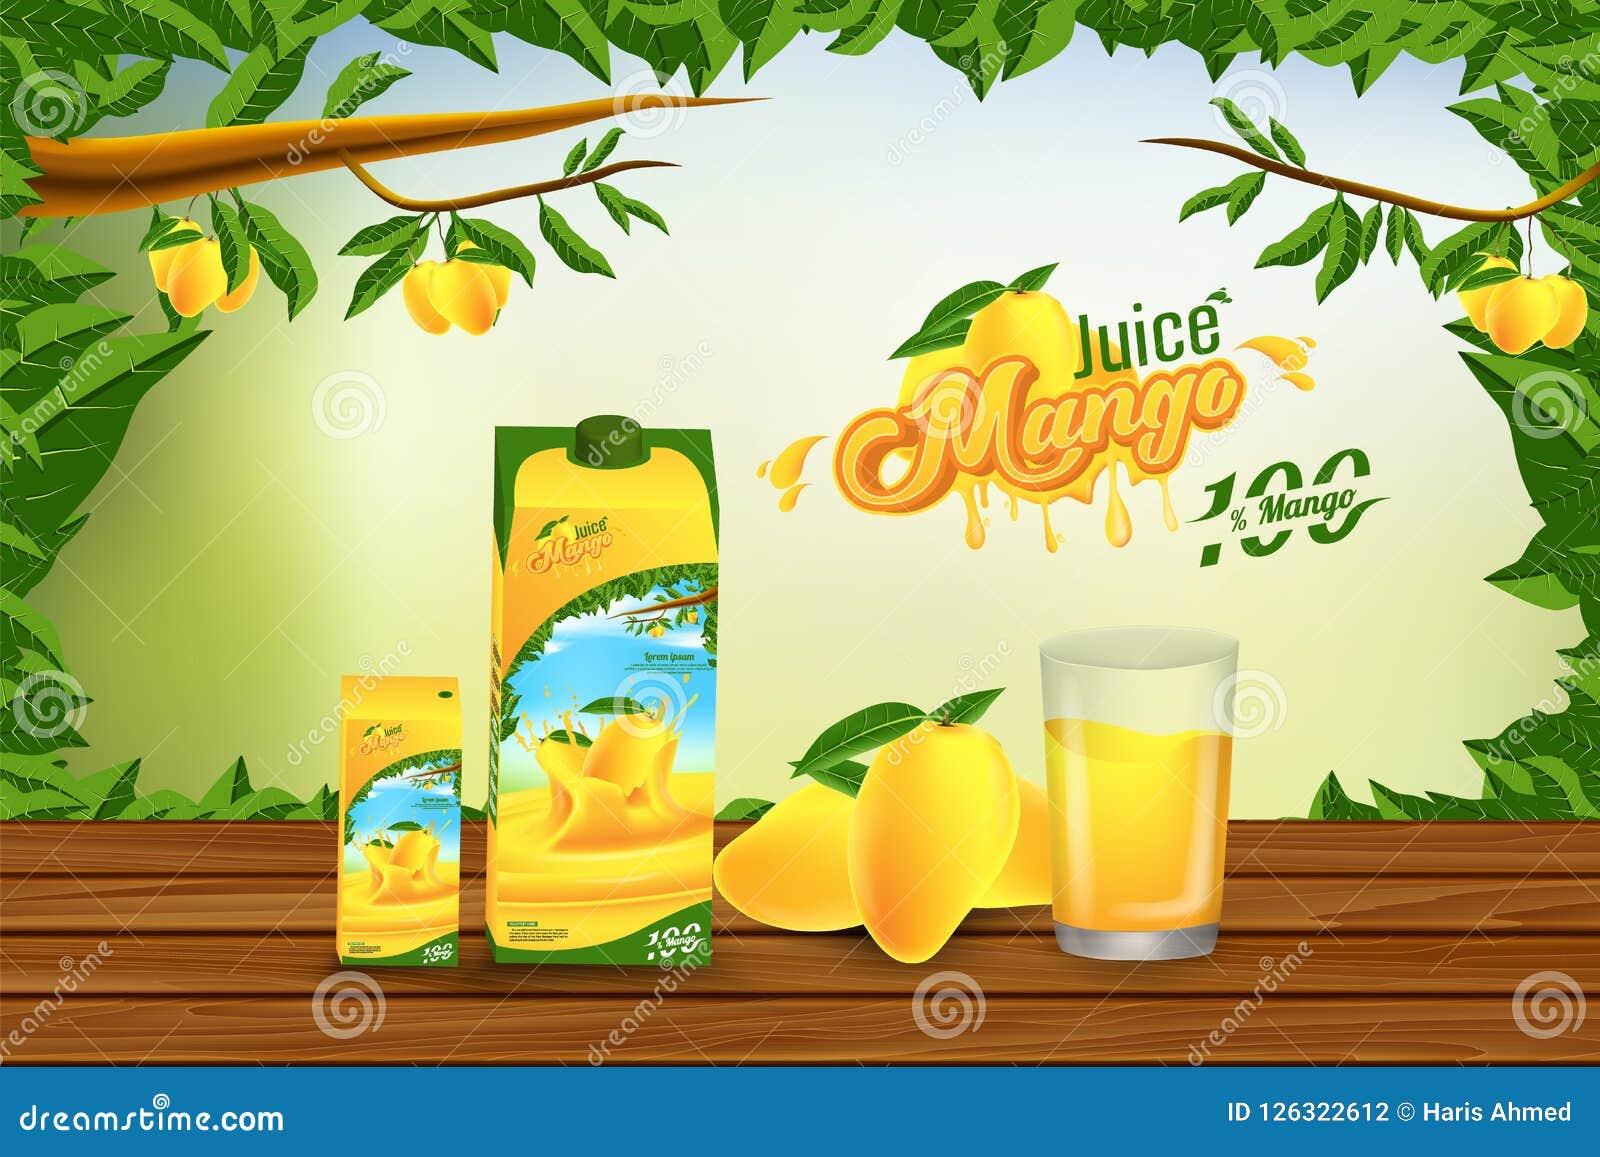 Conception de fond de Juice Advertising Banner Ads Vector de mangue